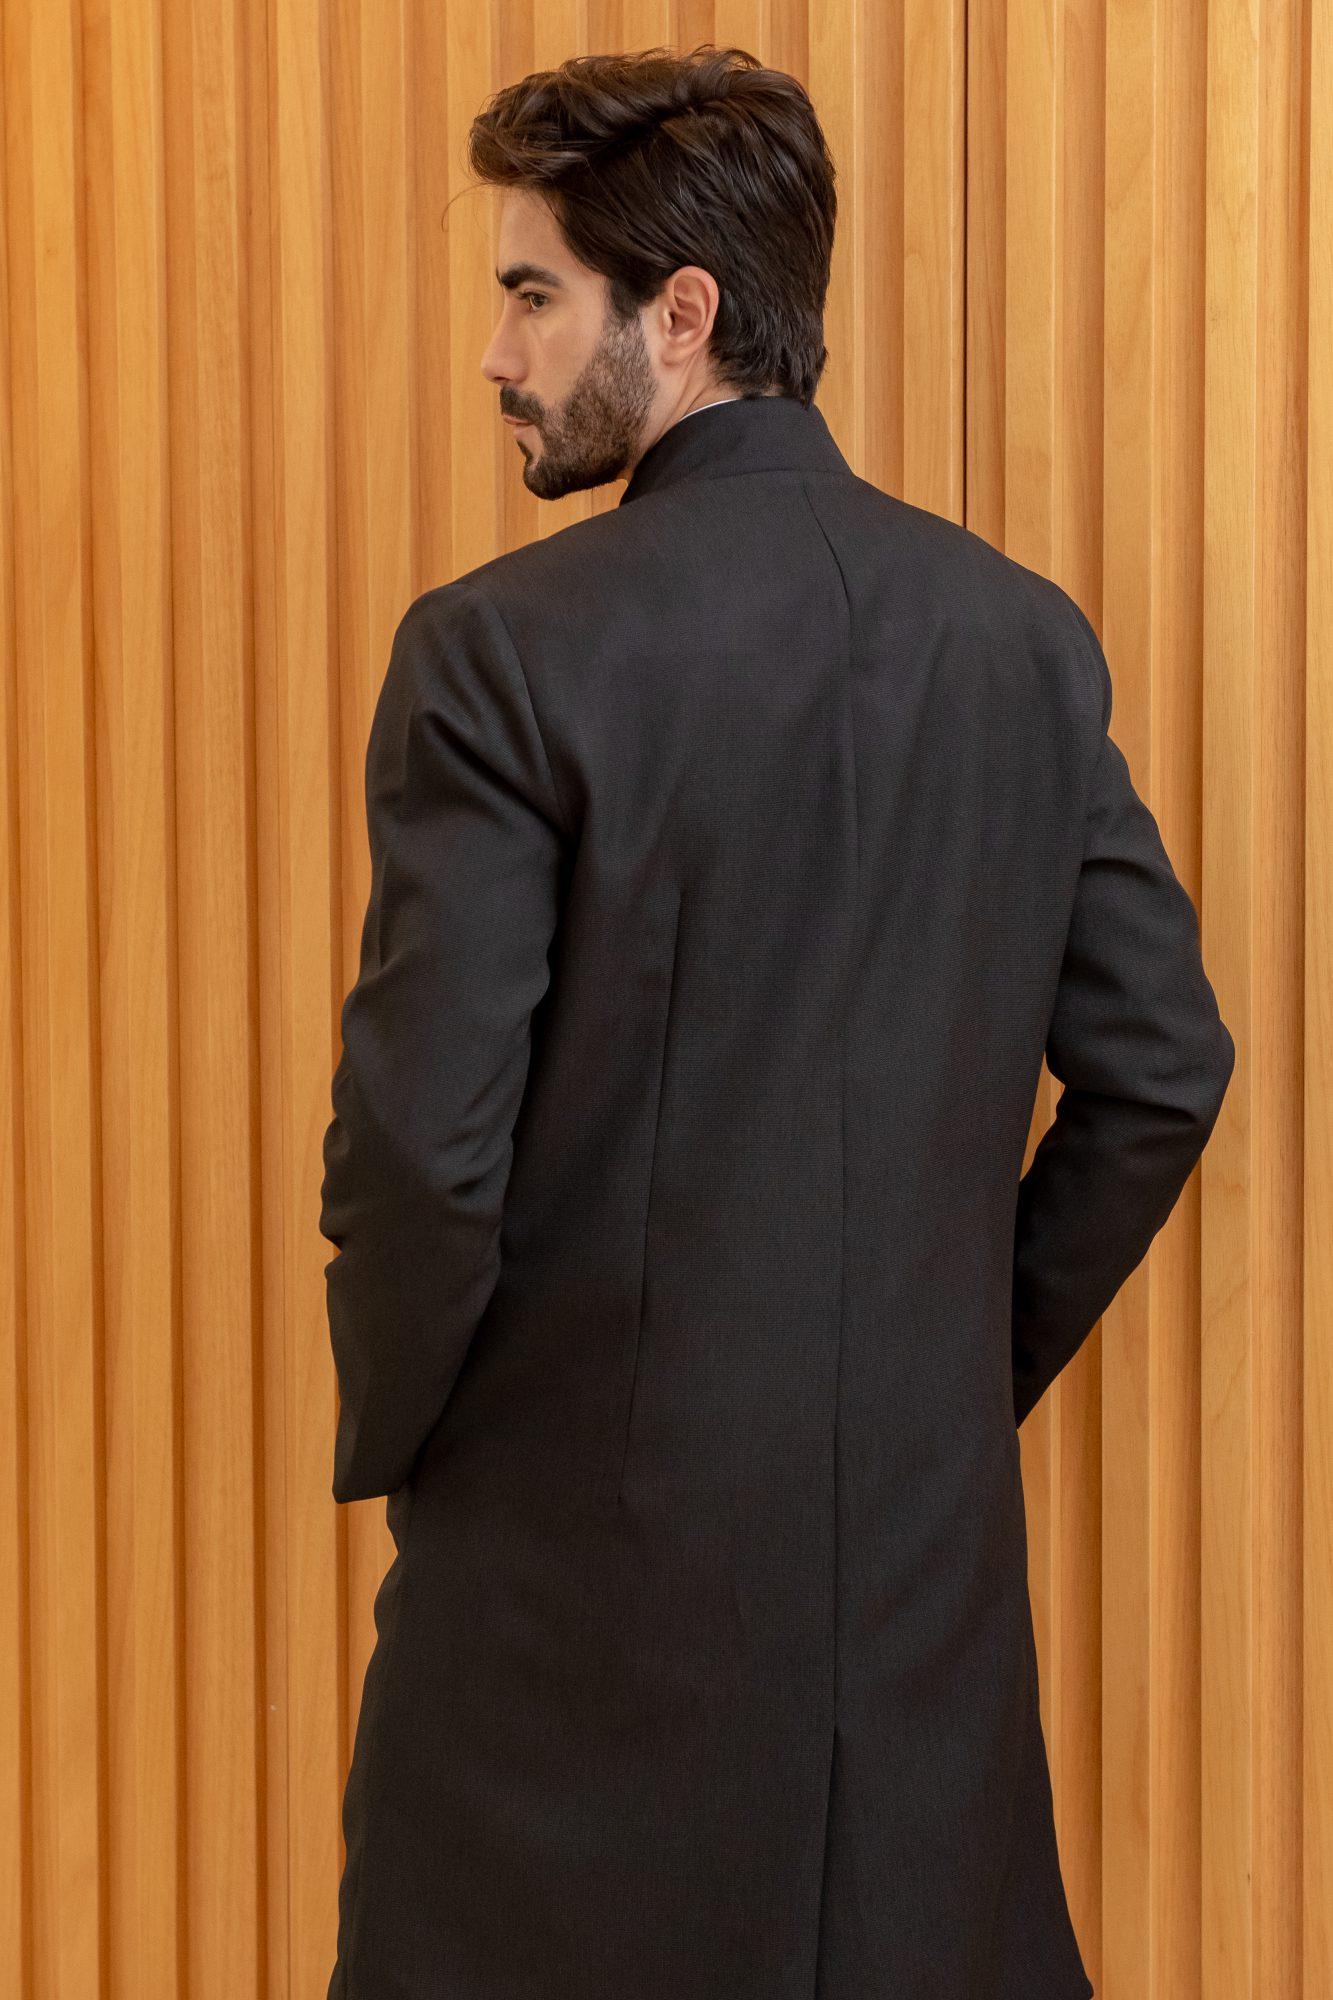 Jaleco Masculino Michael com Ziper Black